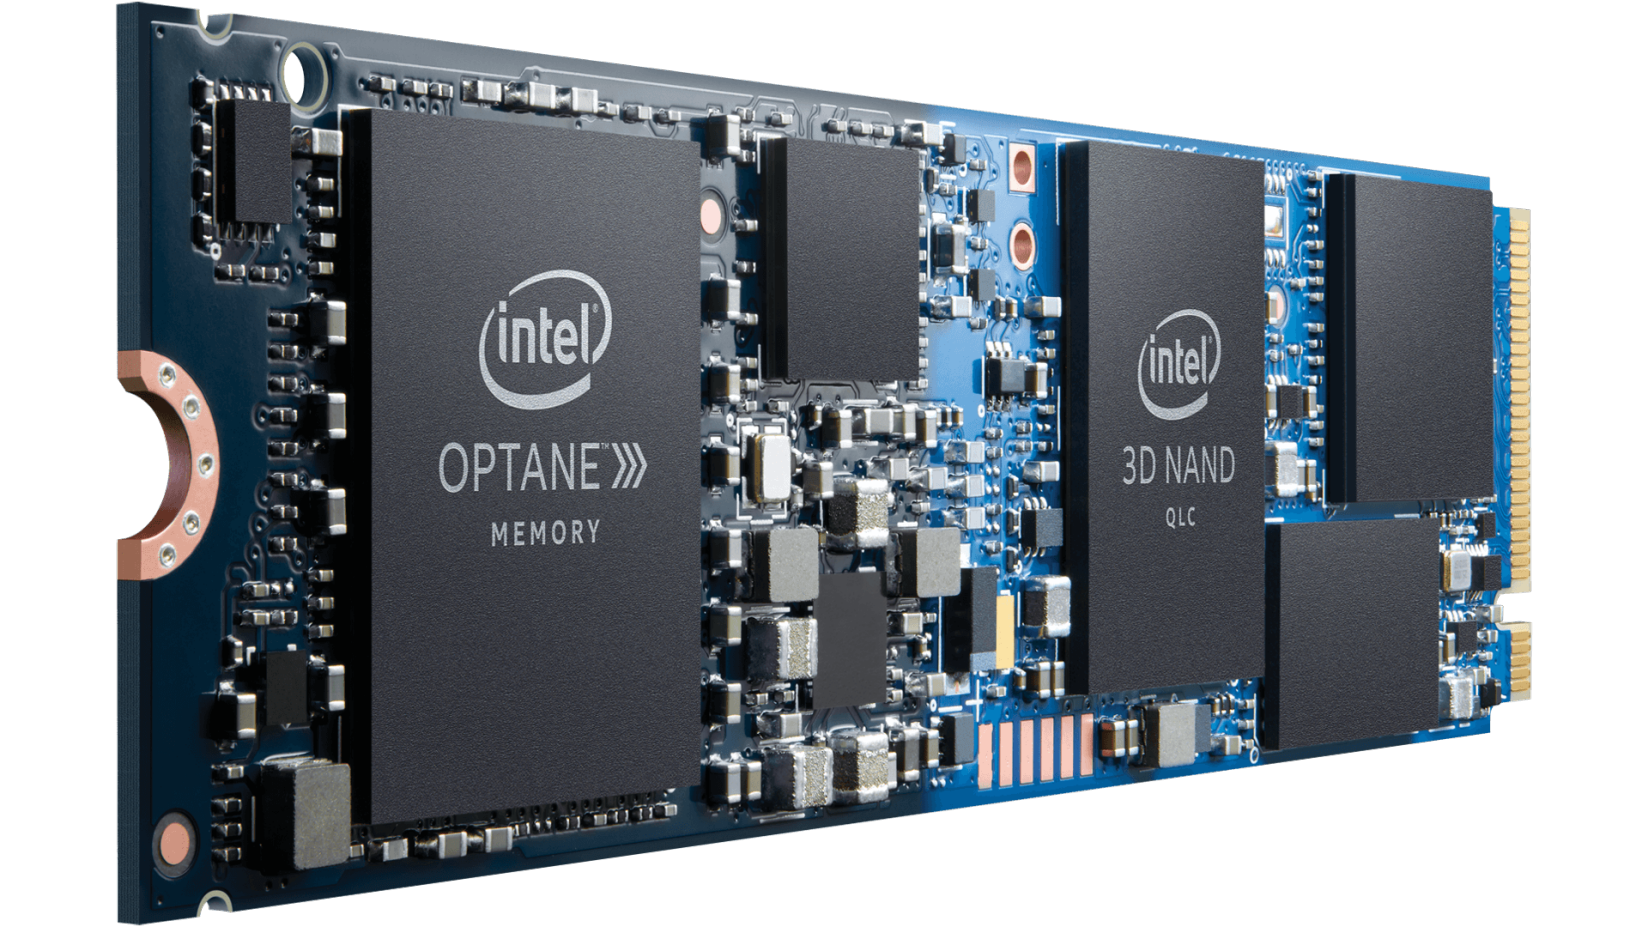 Intel® Optane™ memory